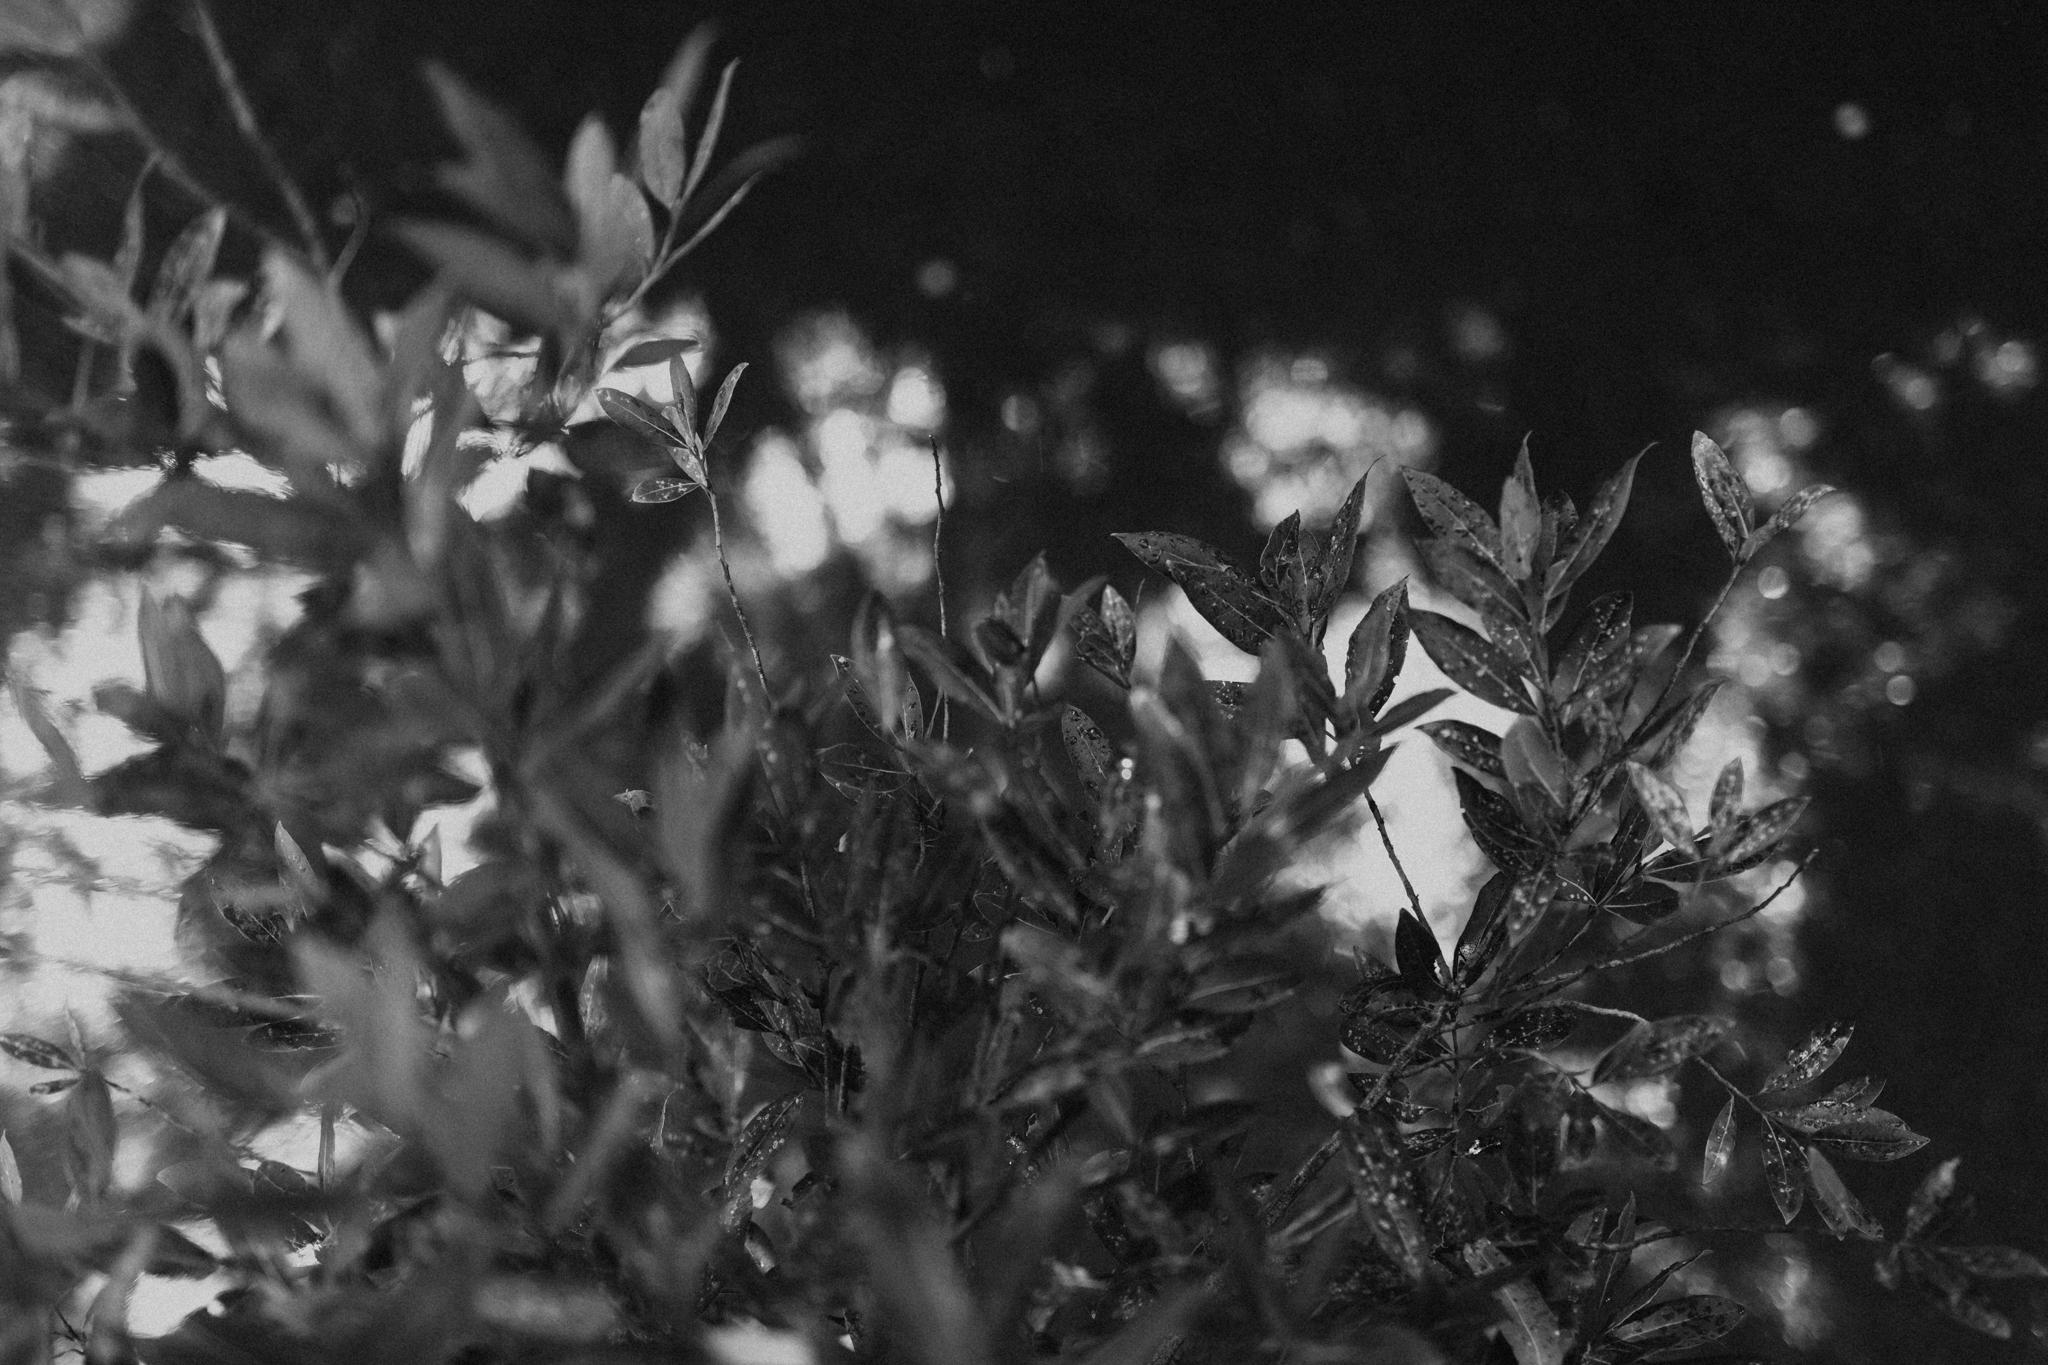 The-Terrace-Royal-Botanic-Gardens-Wedding-Emotions-and-Math-Photography-001.jpg